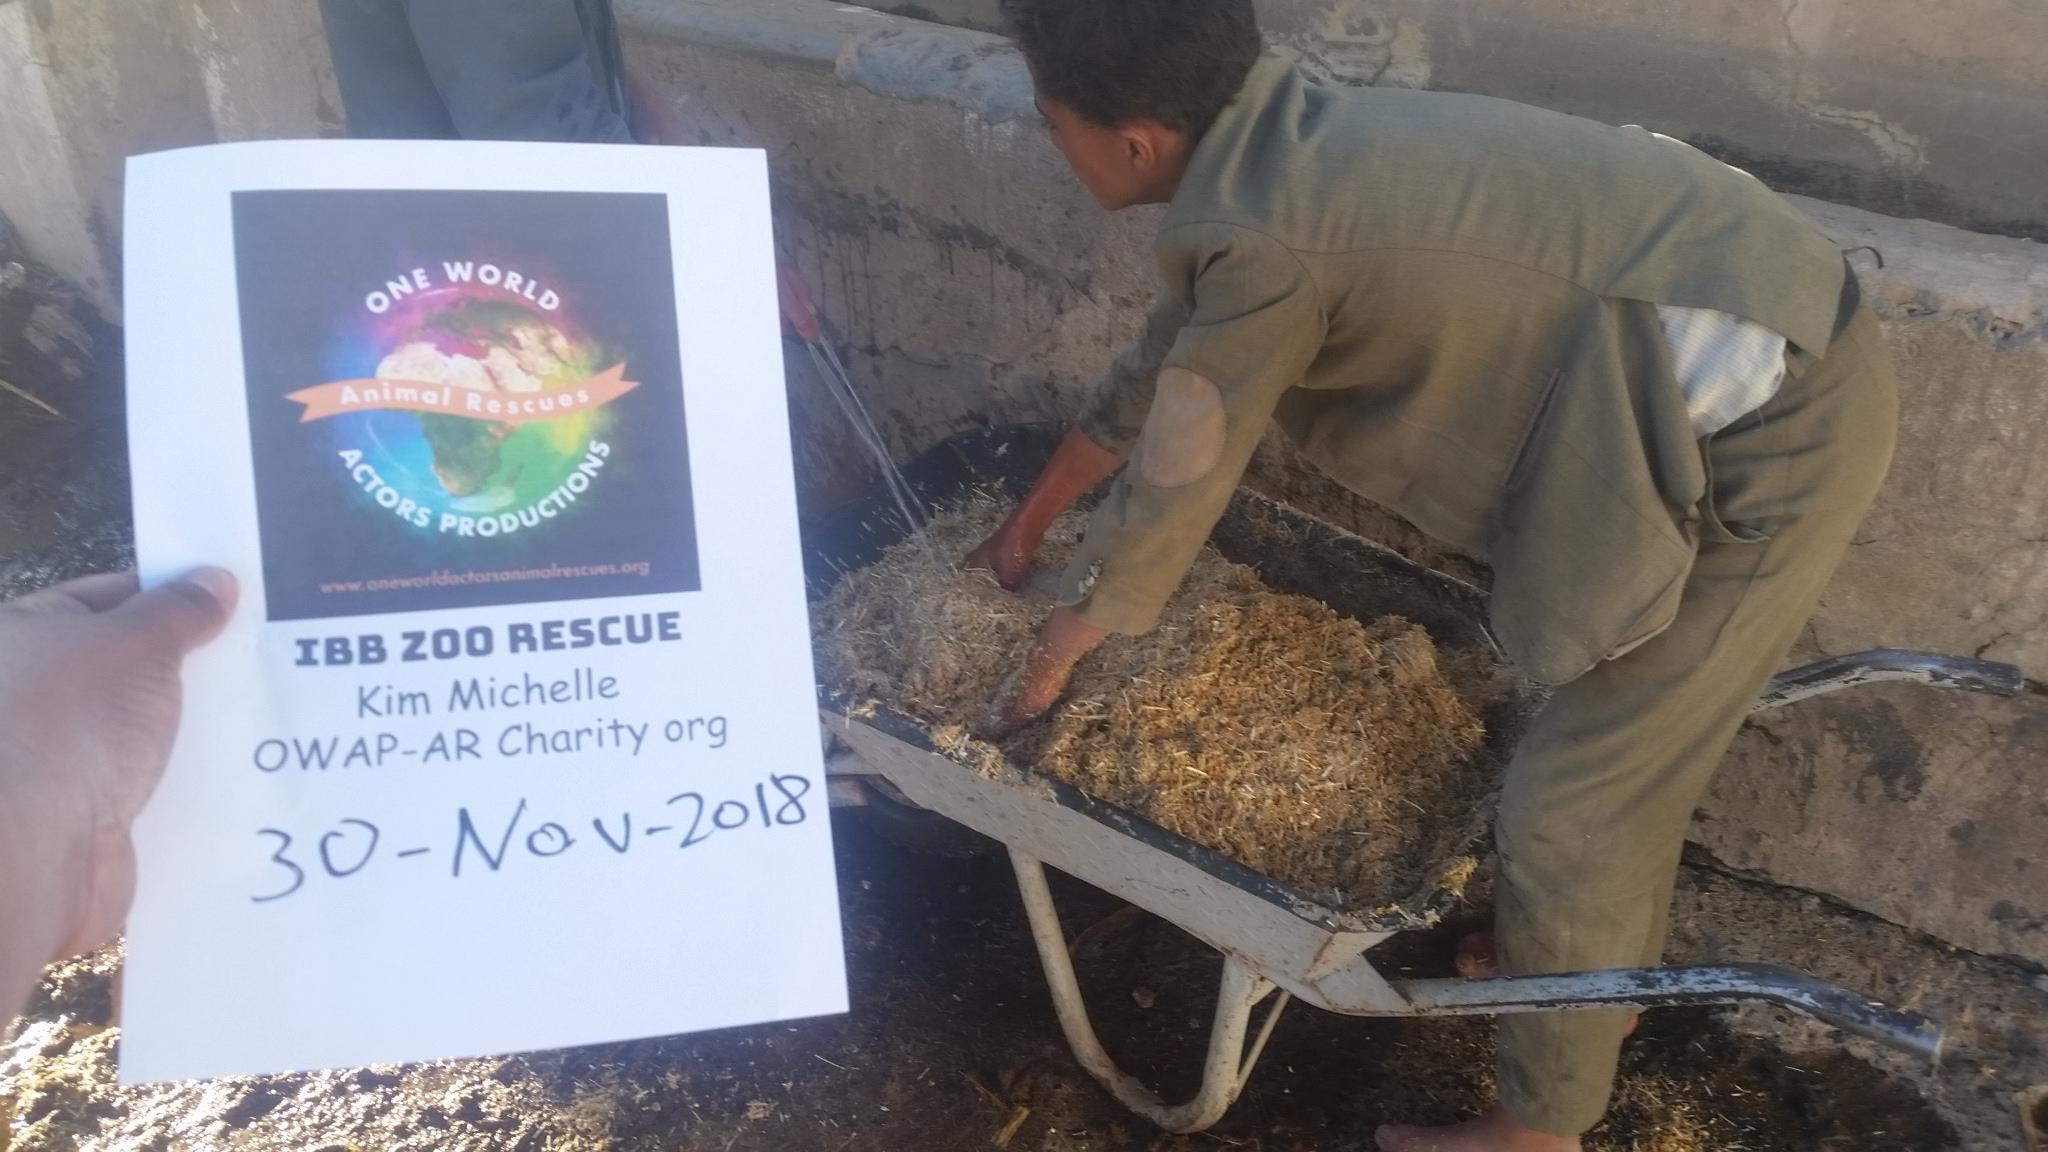 qrab dhamar preparing the fodder special feed from OWAP-AR N-P 30 NOV 2018 for 19 Horses.jpg